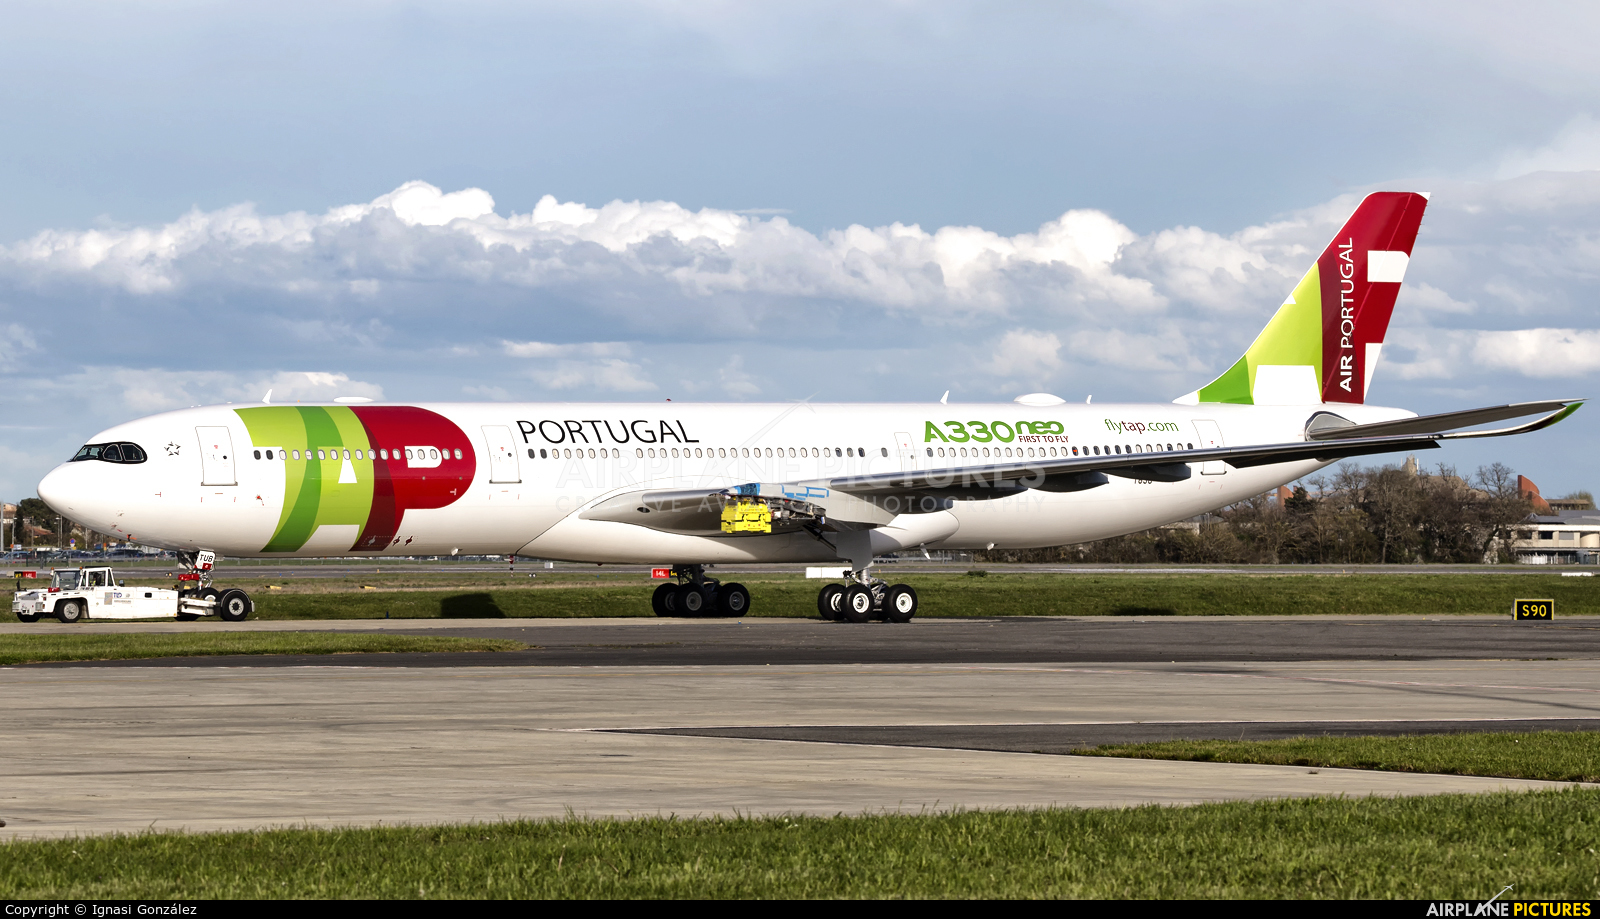 CS-TUB - TAP Portugal Airbus A330neo at Toulouse - Blagnac | Photo ...